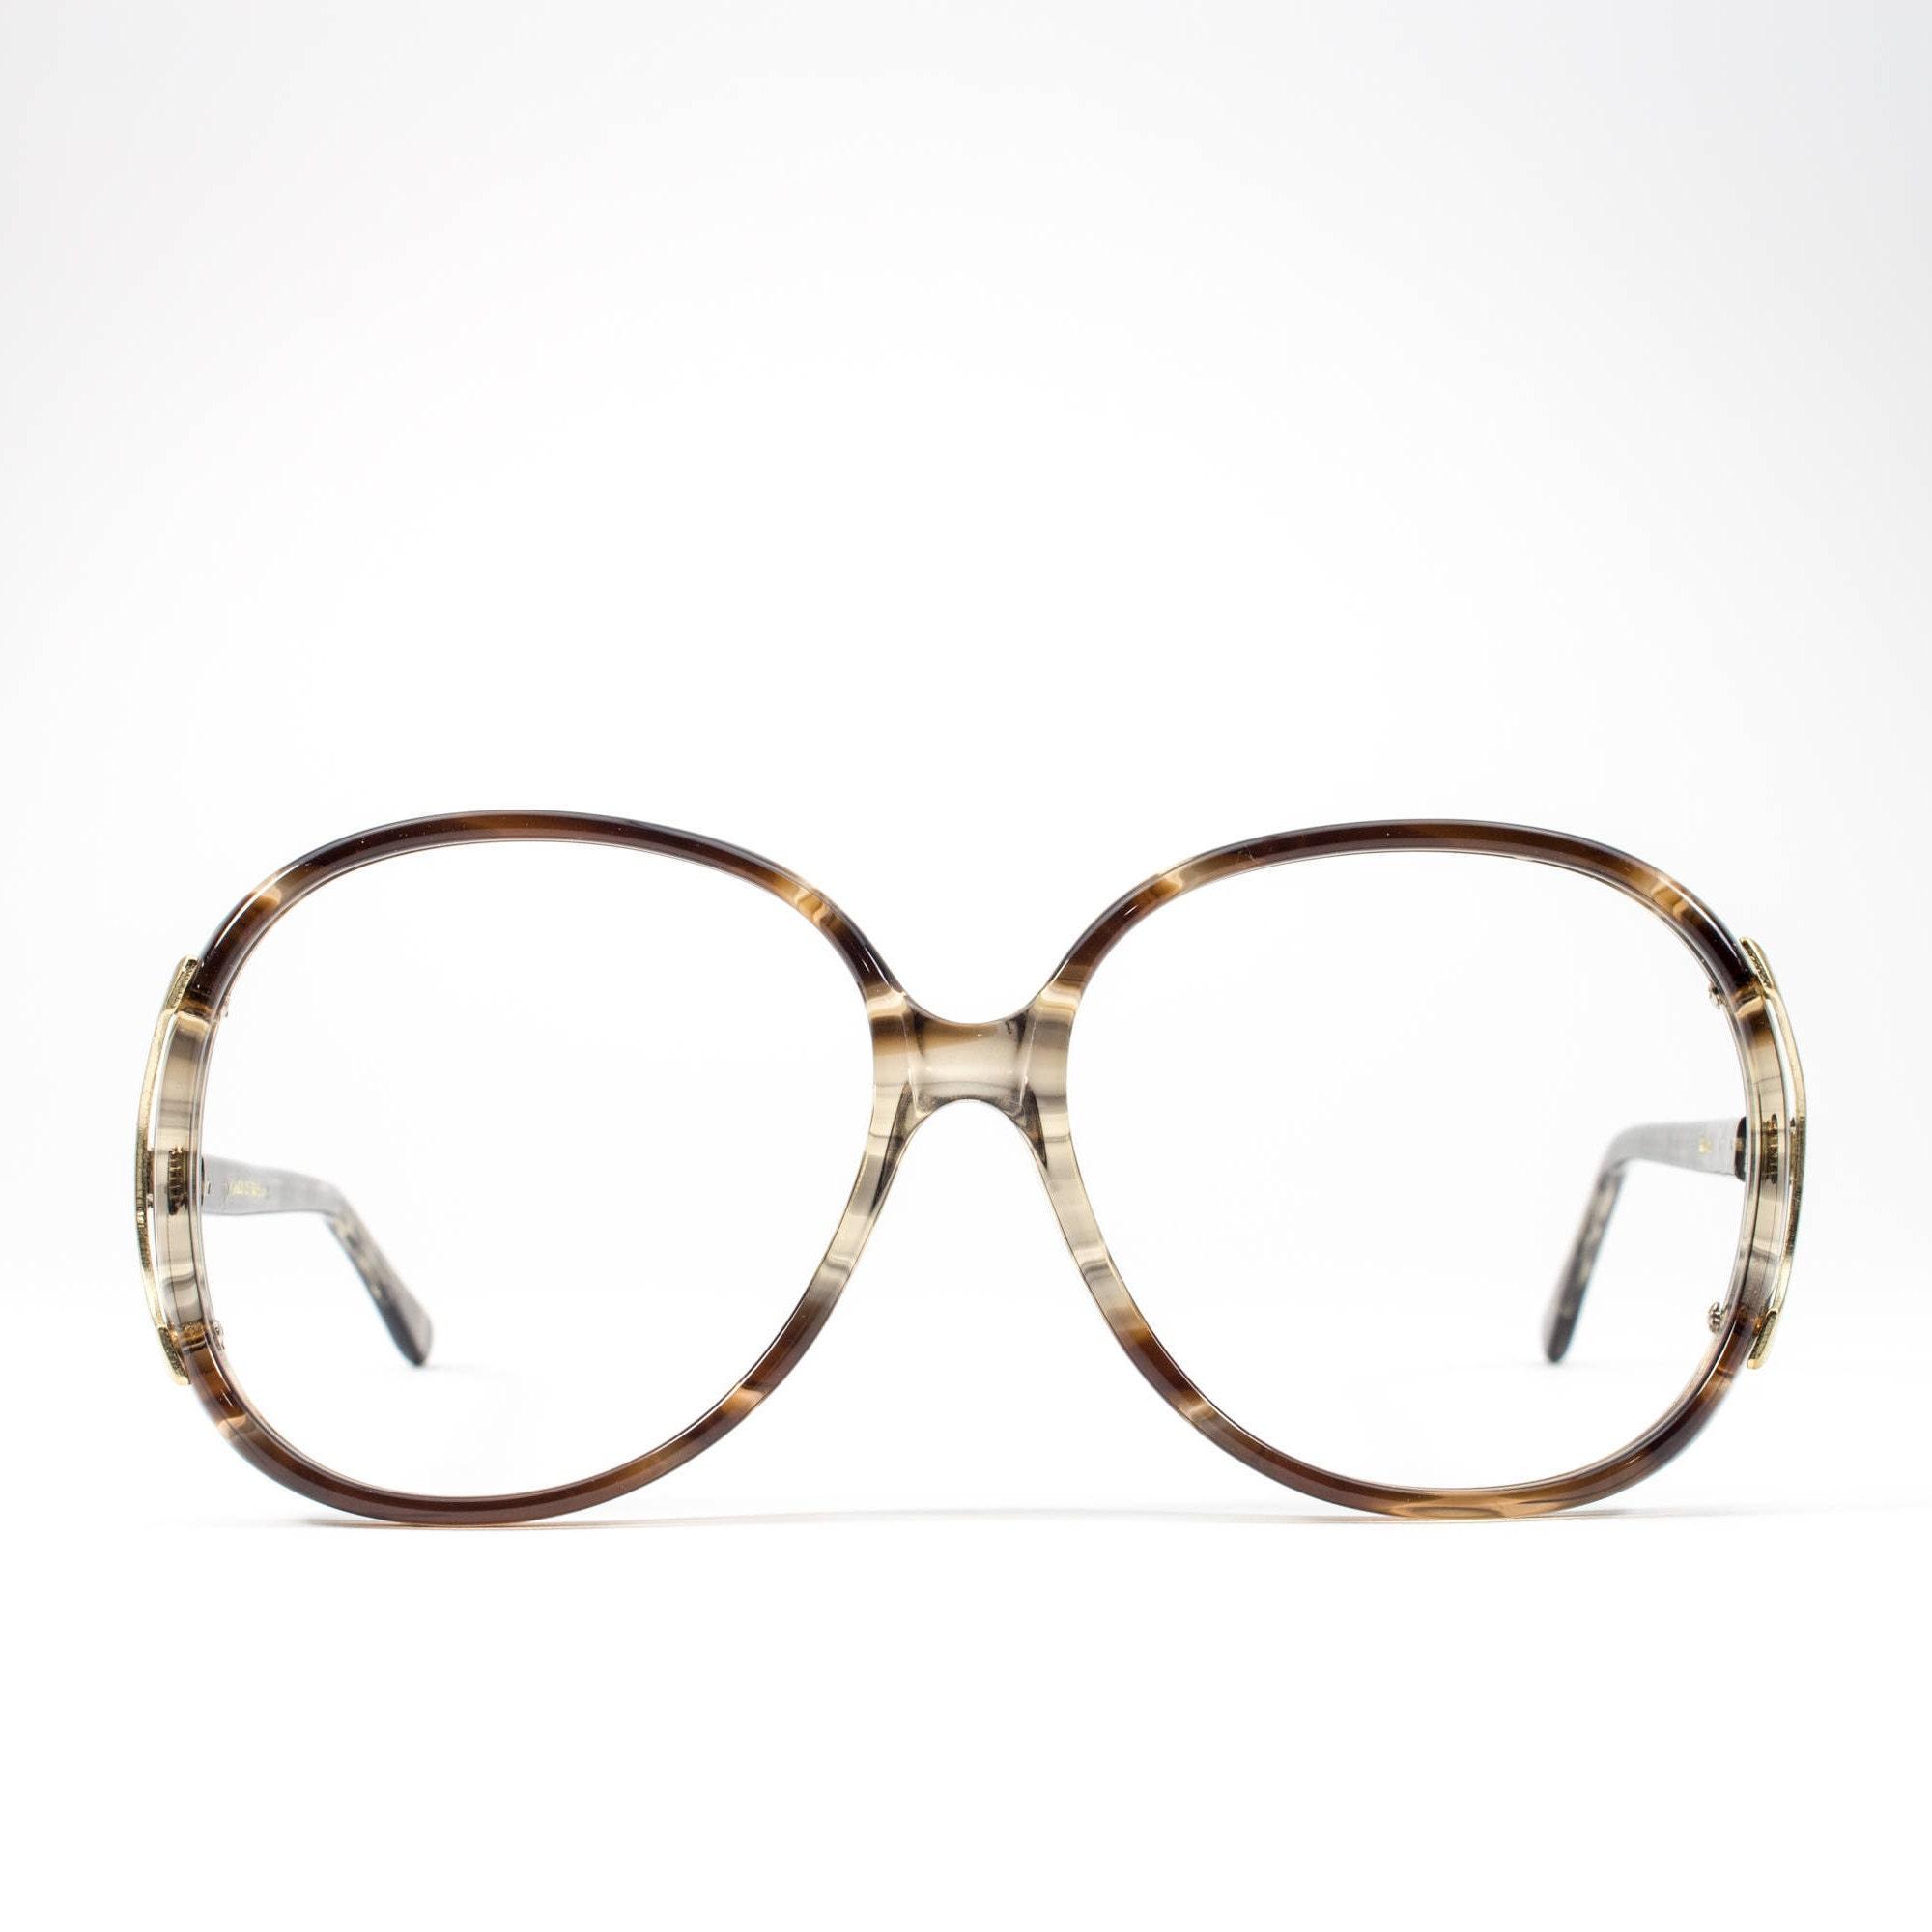 Big 80s Glasses | Vintage Eyeglasses | 1980s Oversized Glasses ...